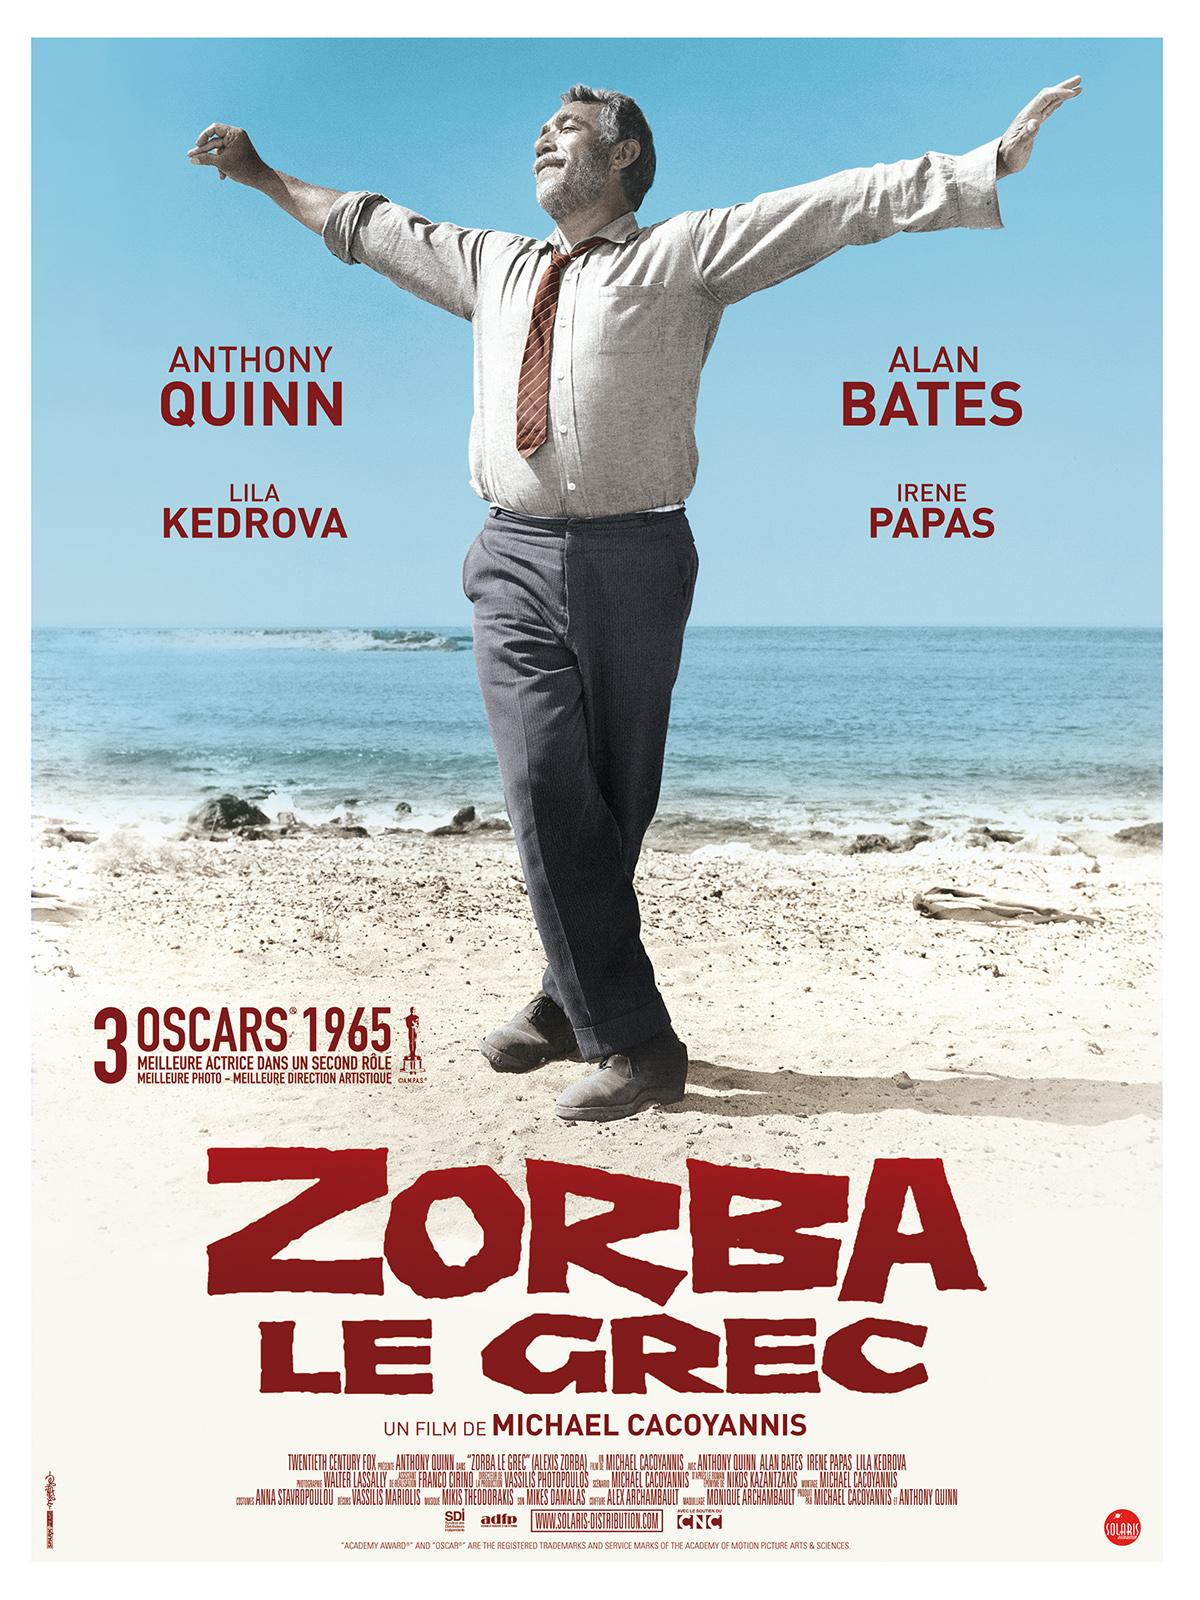 FILME GREC LE TÉLÉCHARGER ZORBA